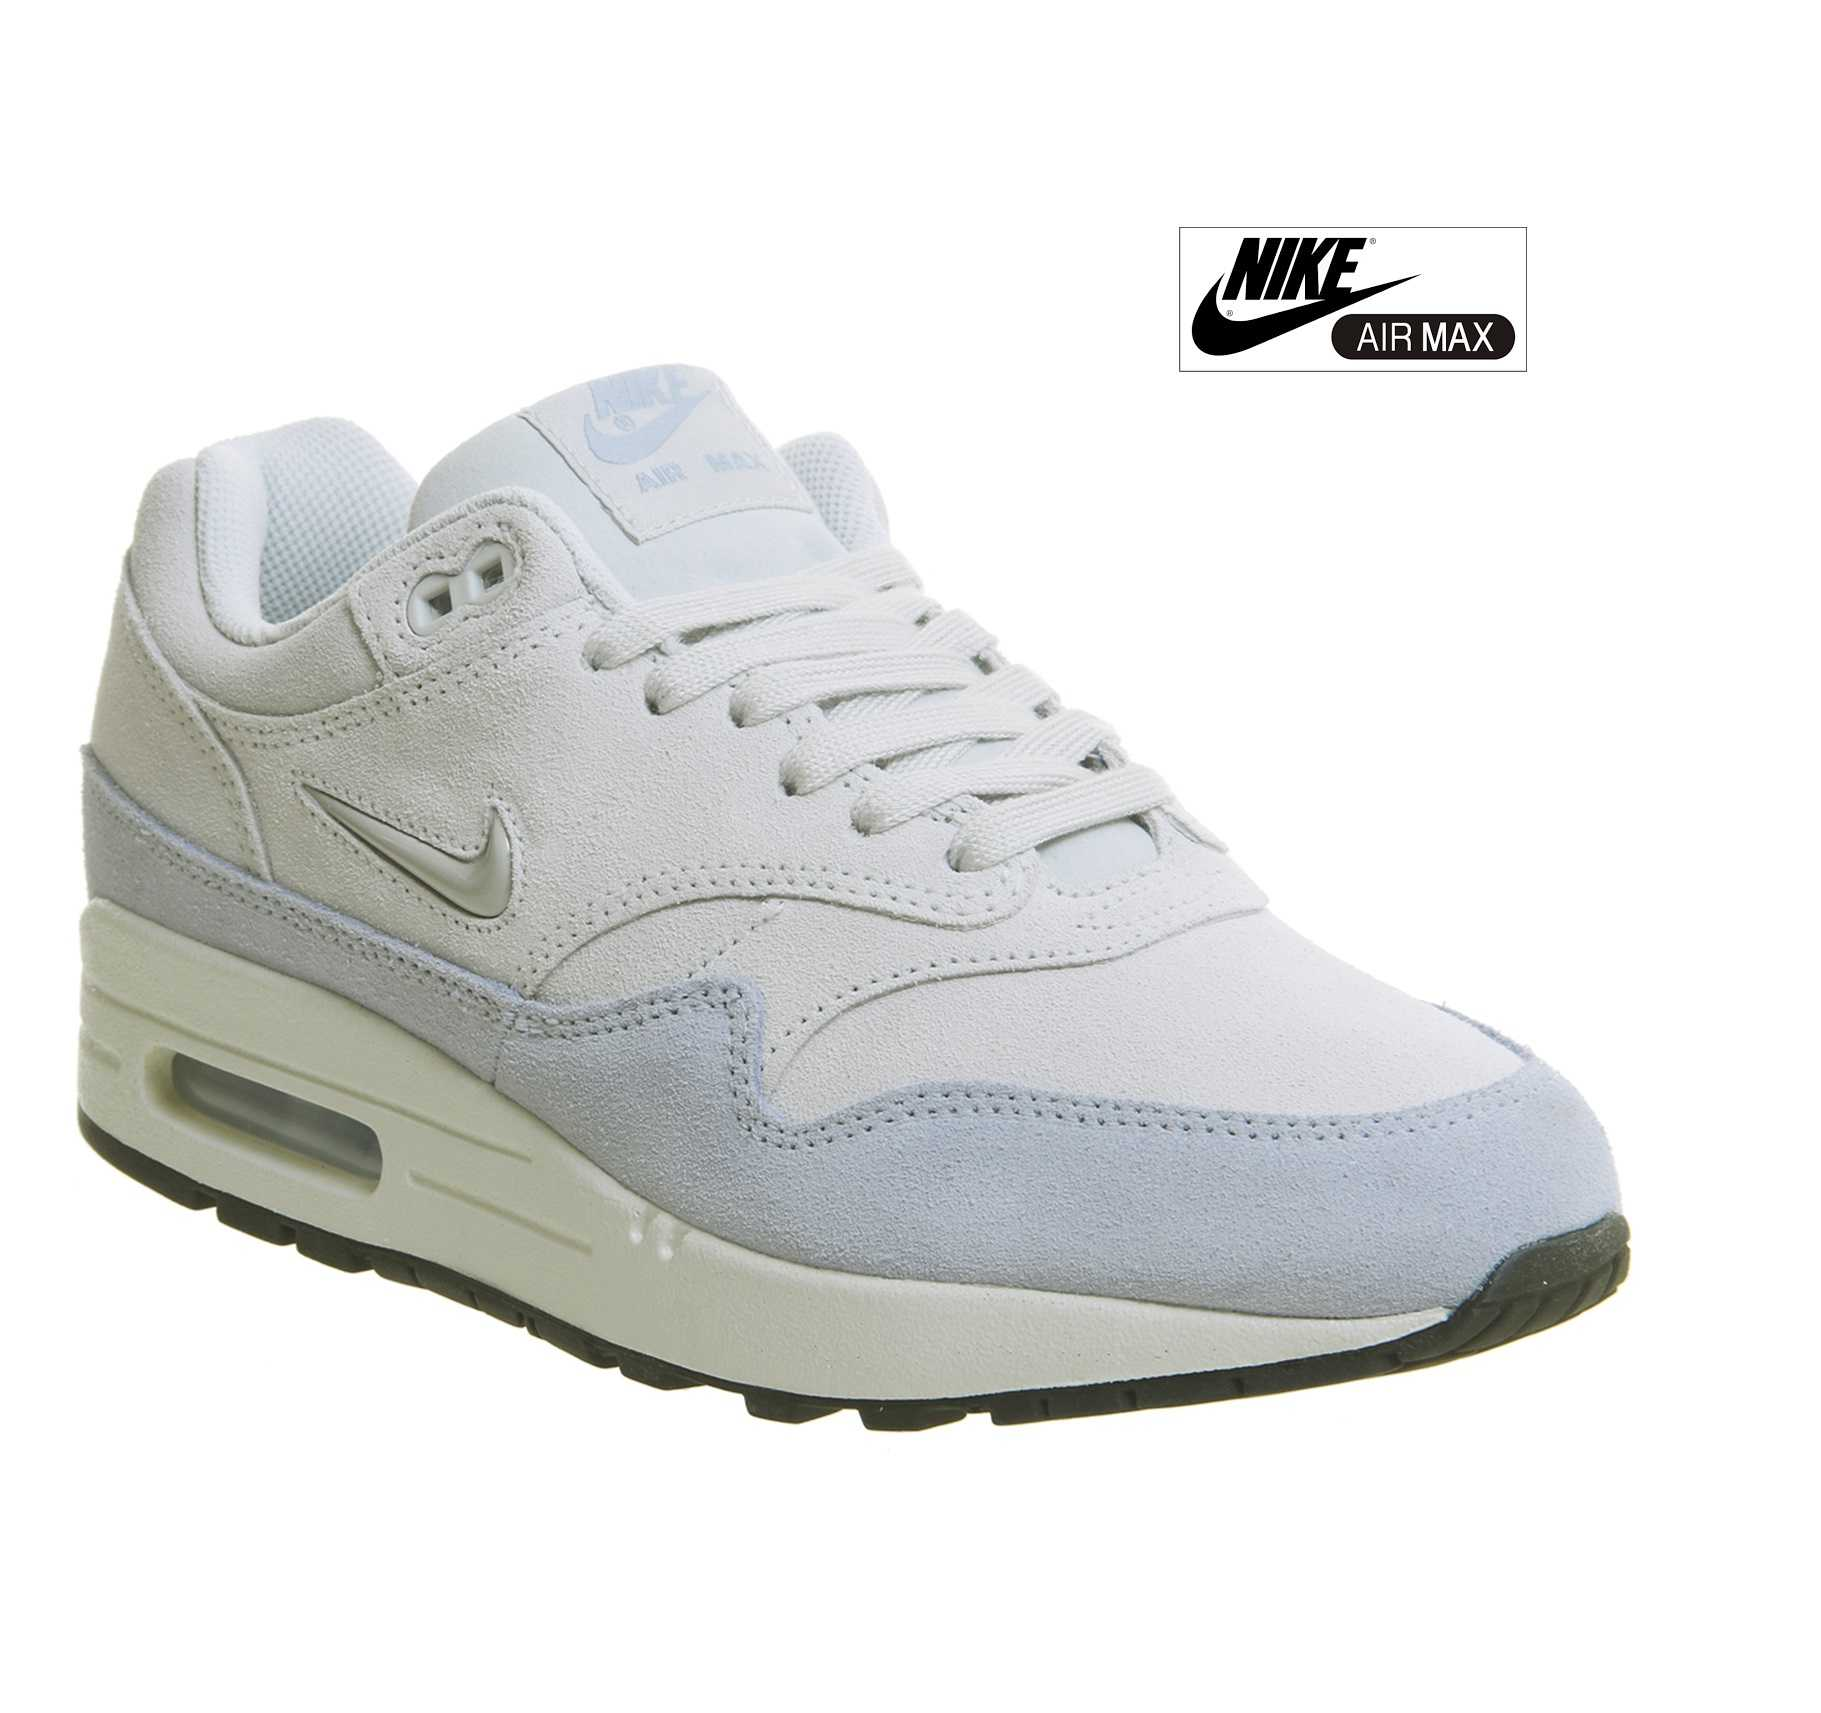 sale online aliexpress new lifestyle Nike Air Max 1 Jewel Pure Damen Sneaker für 60,-€ inkl ...